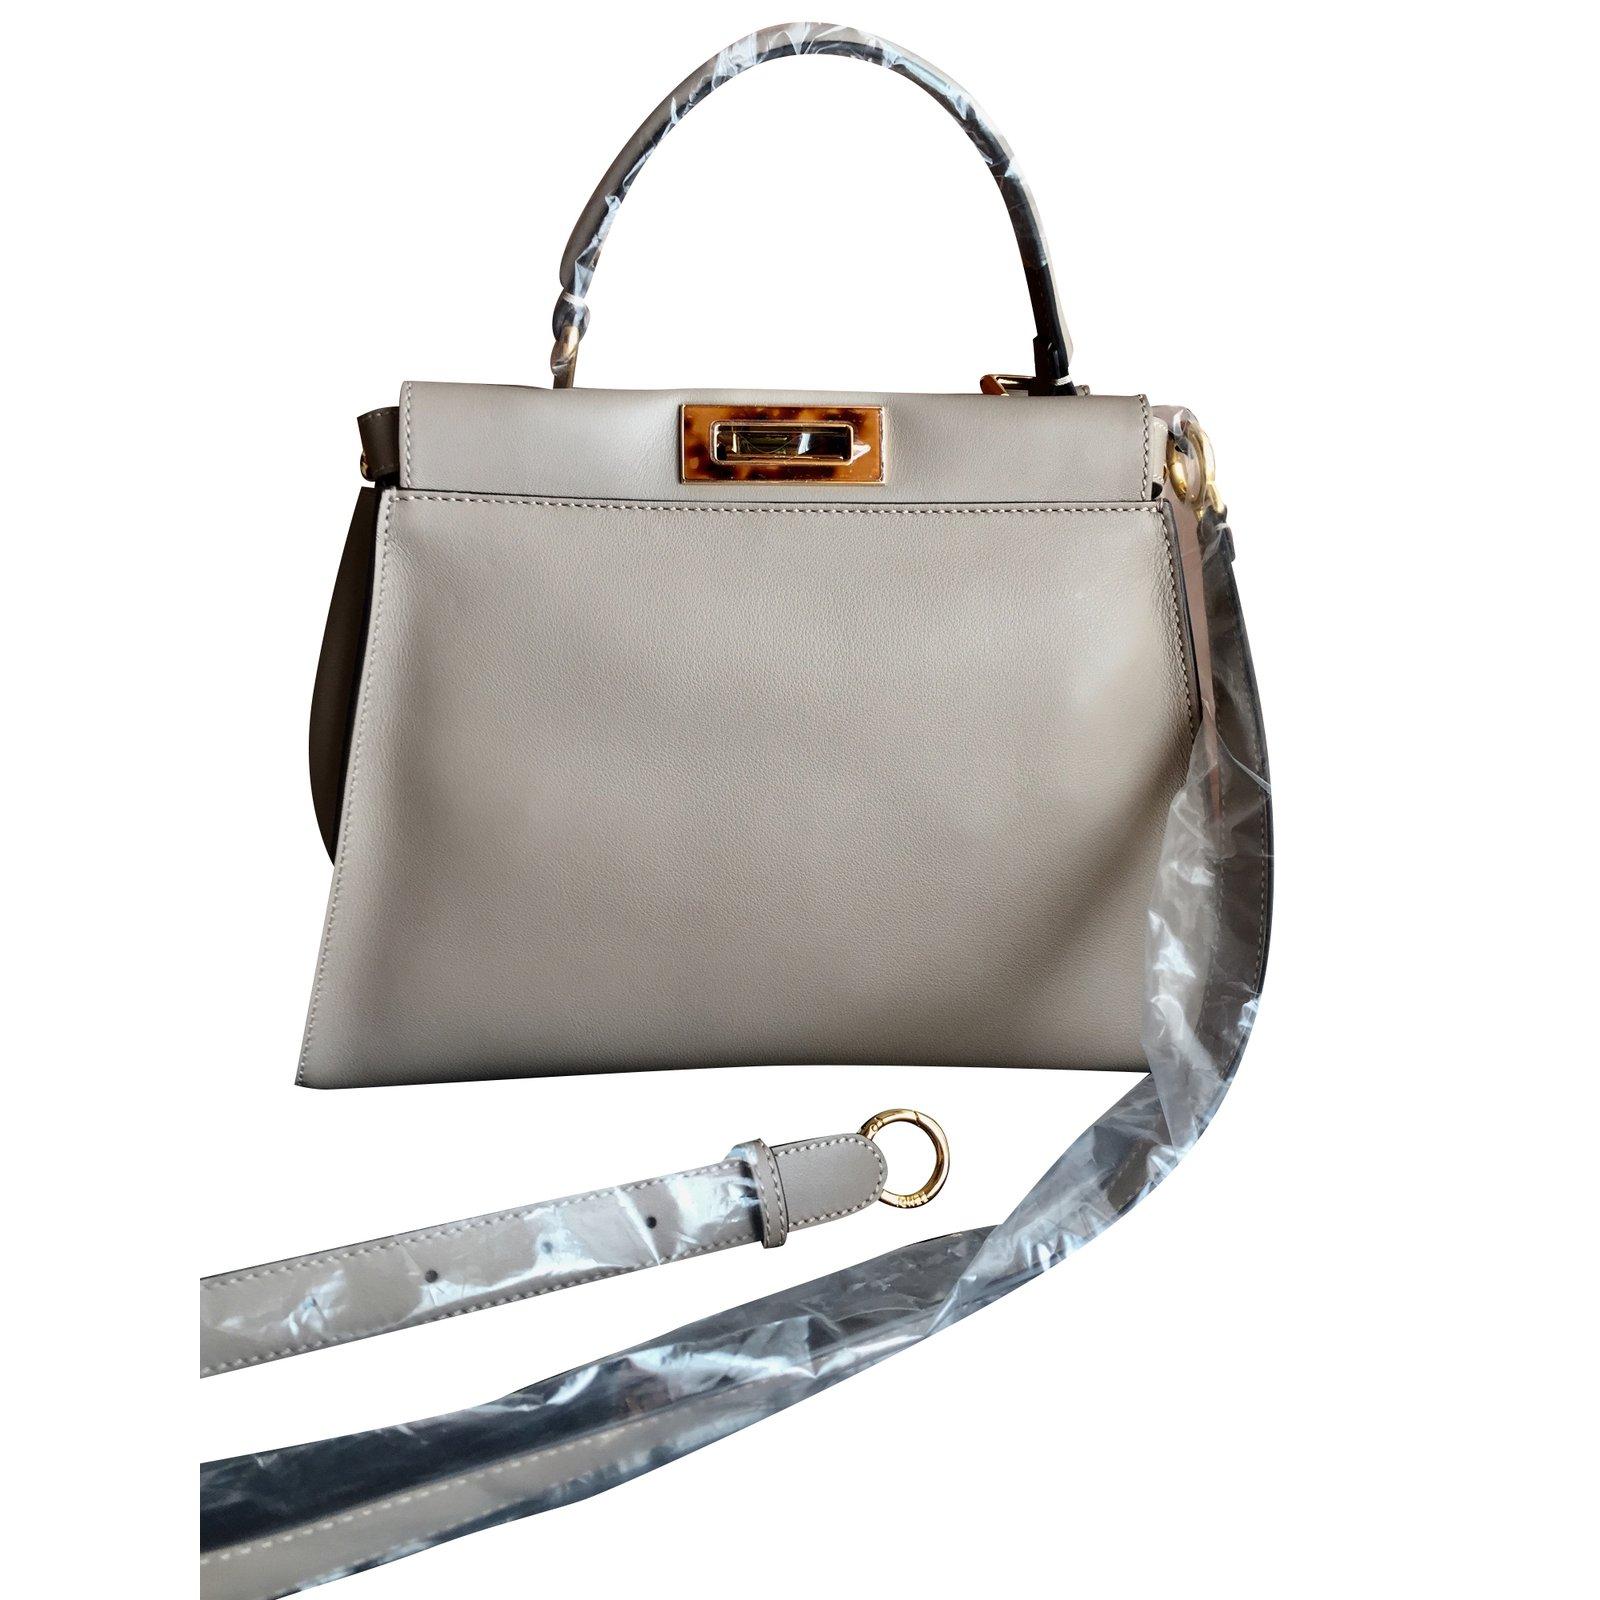 f017bc6c93 ... new zealand fendi peekaboo regular handbags leather grey ref.36773  7c48d 125a8